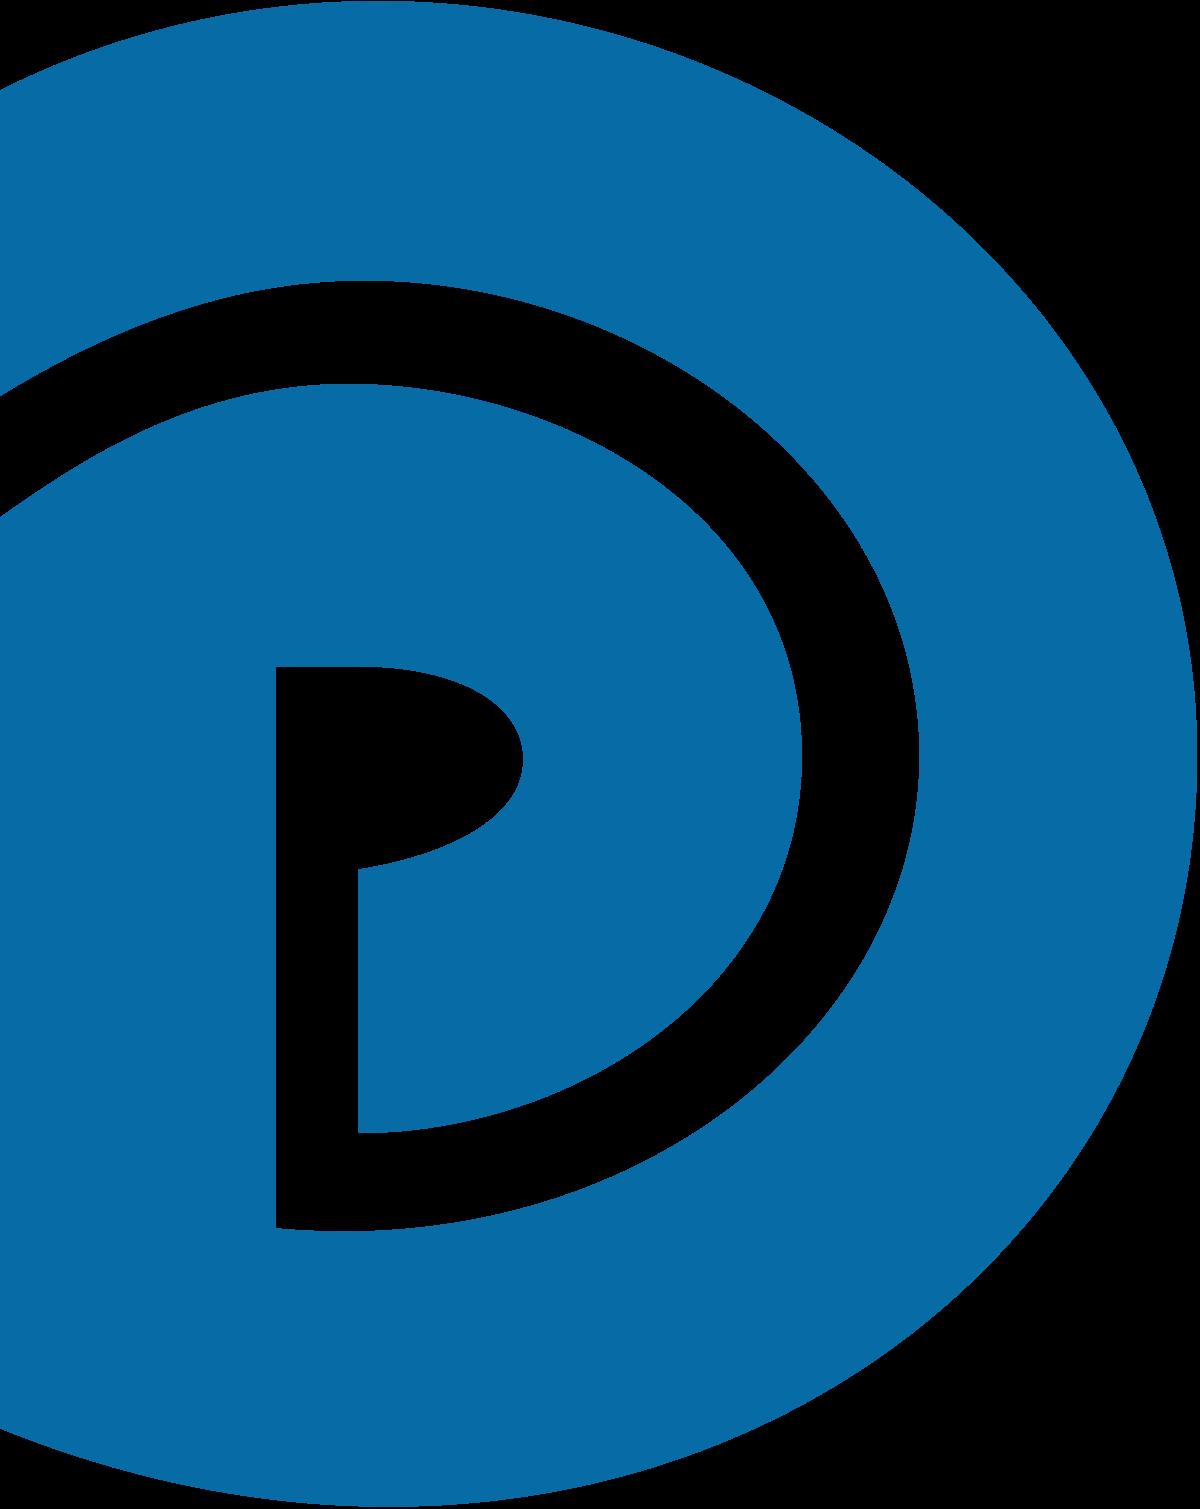 Democratic party of albania. Democracy clipart conservatism